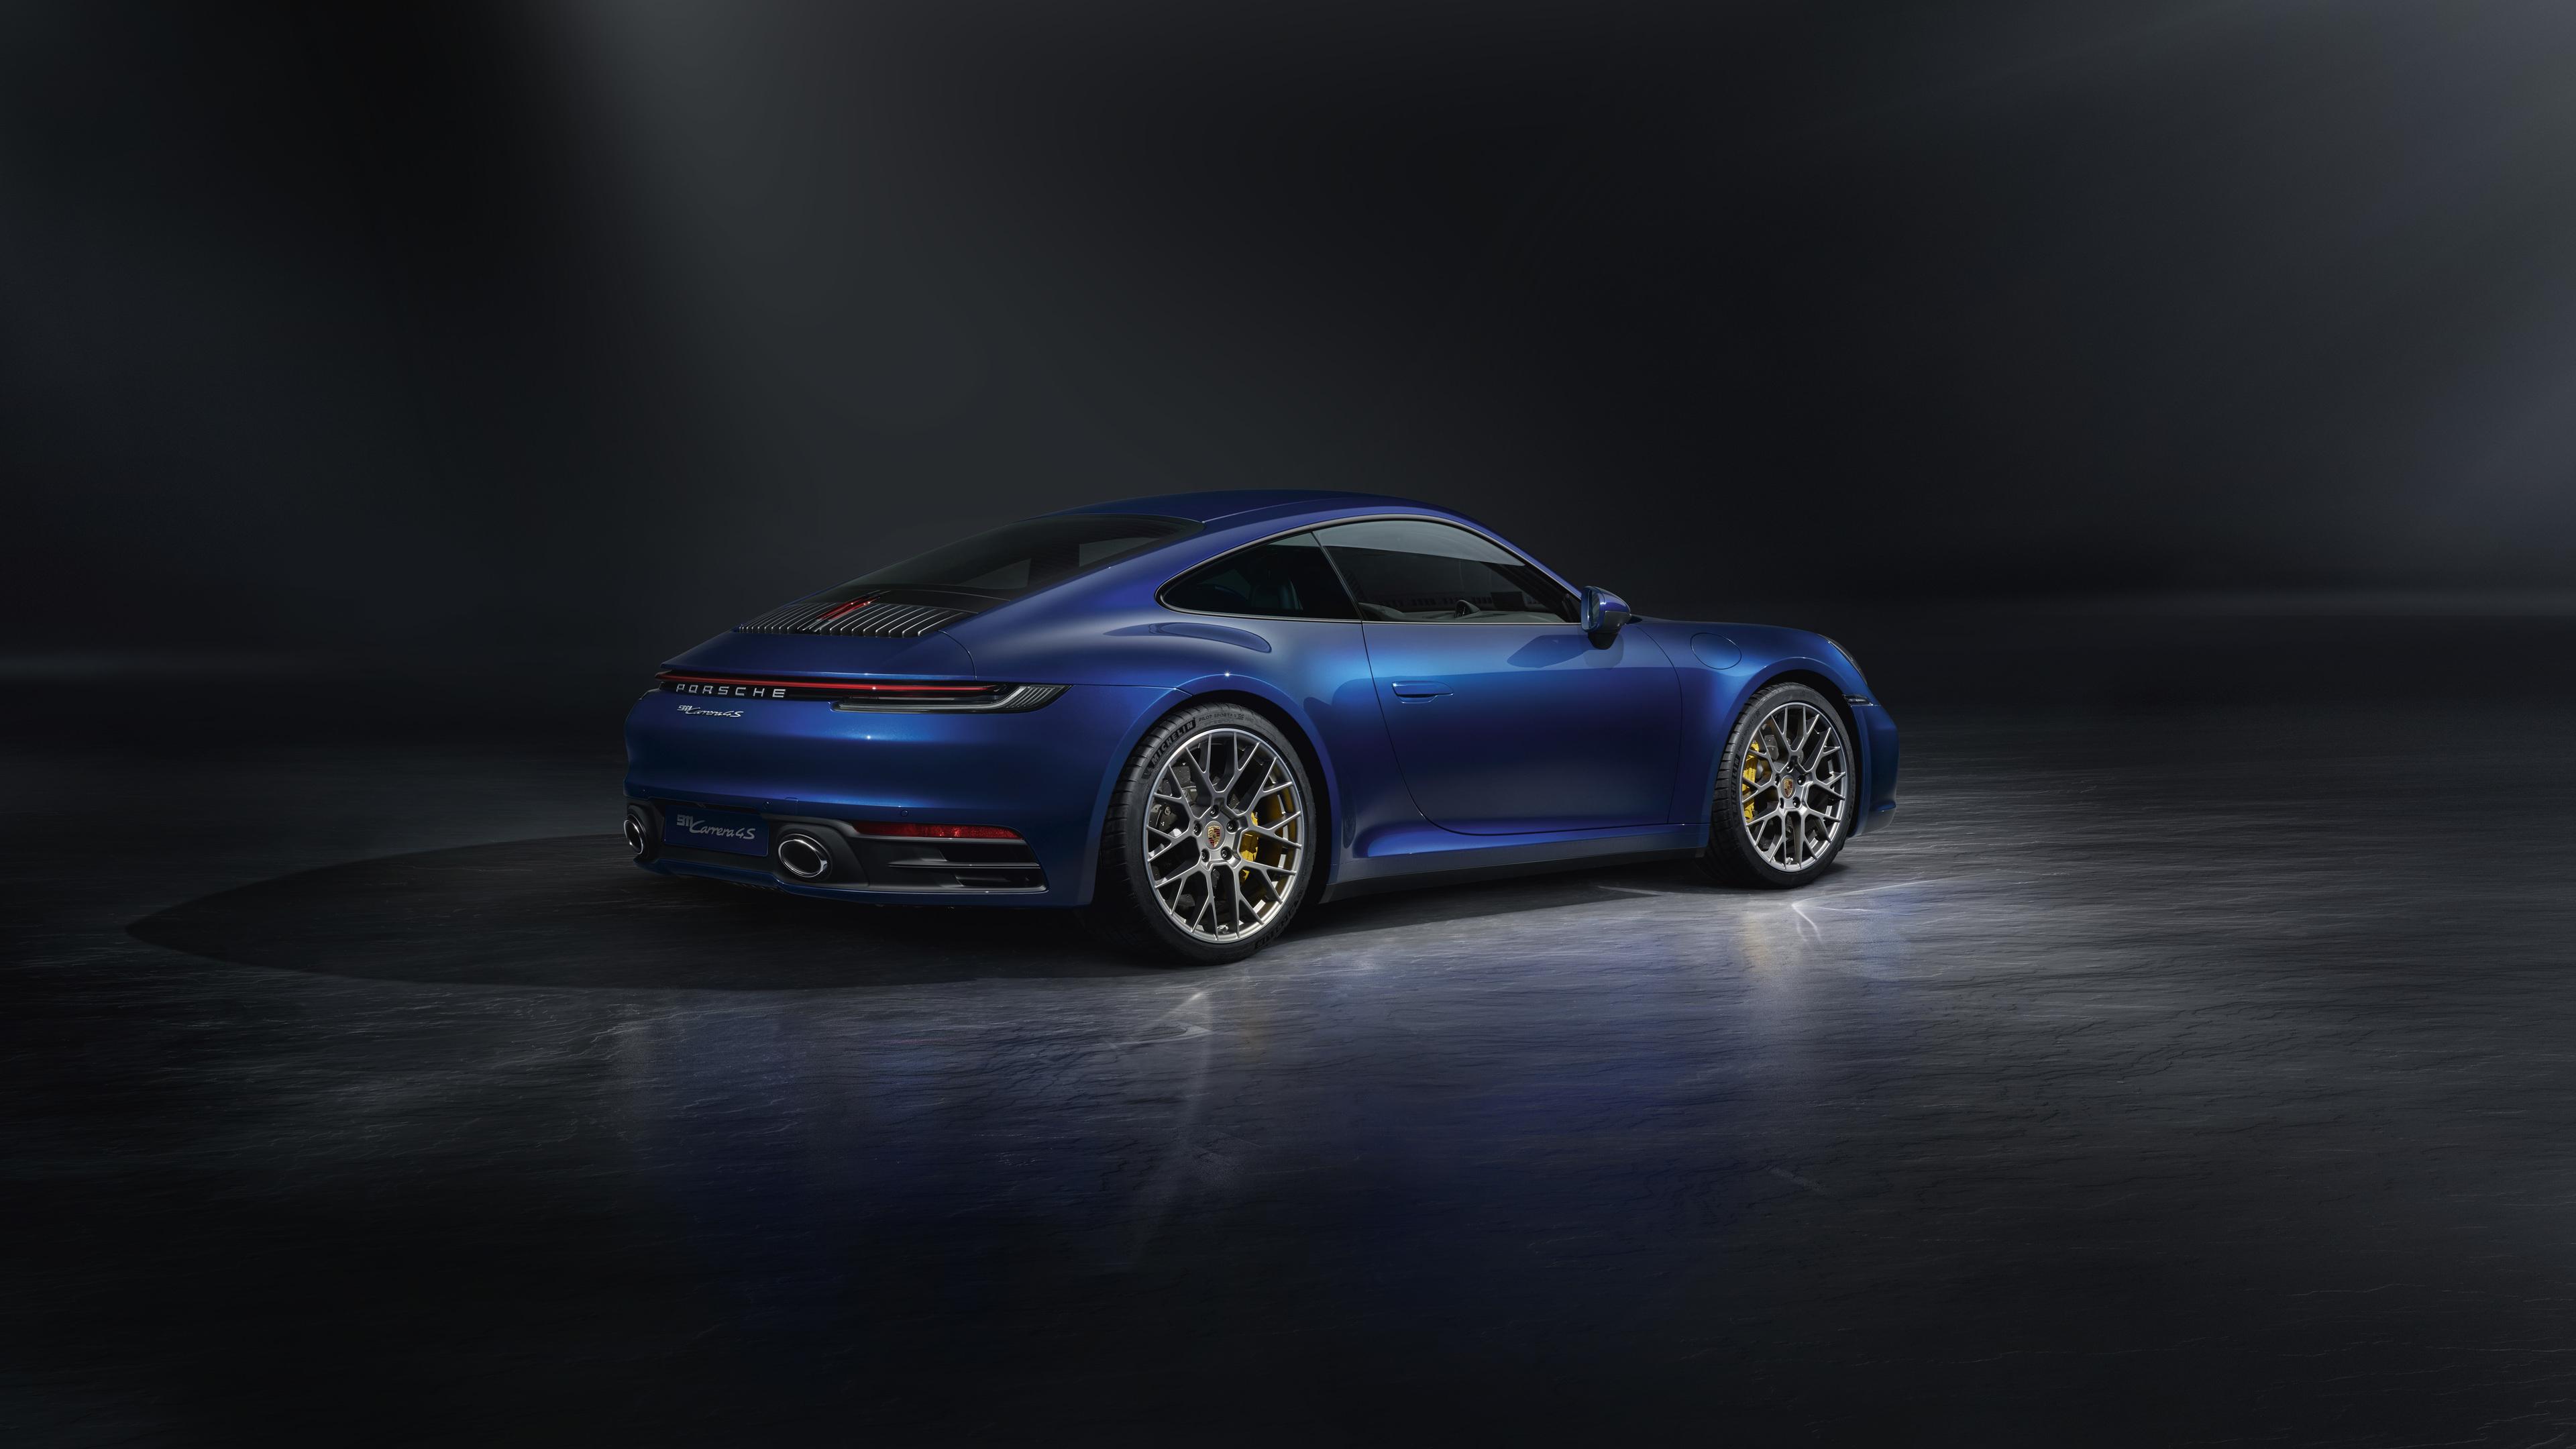 blue porsche 911 rear 4k 1546362092 - Blue Porsche 911 Rear 4k - porsche wallpapers, porsche 911 wallpapers, hd-wallpapers, cars wallpapers, 5k wallpapers, 4k-wallpapers